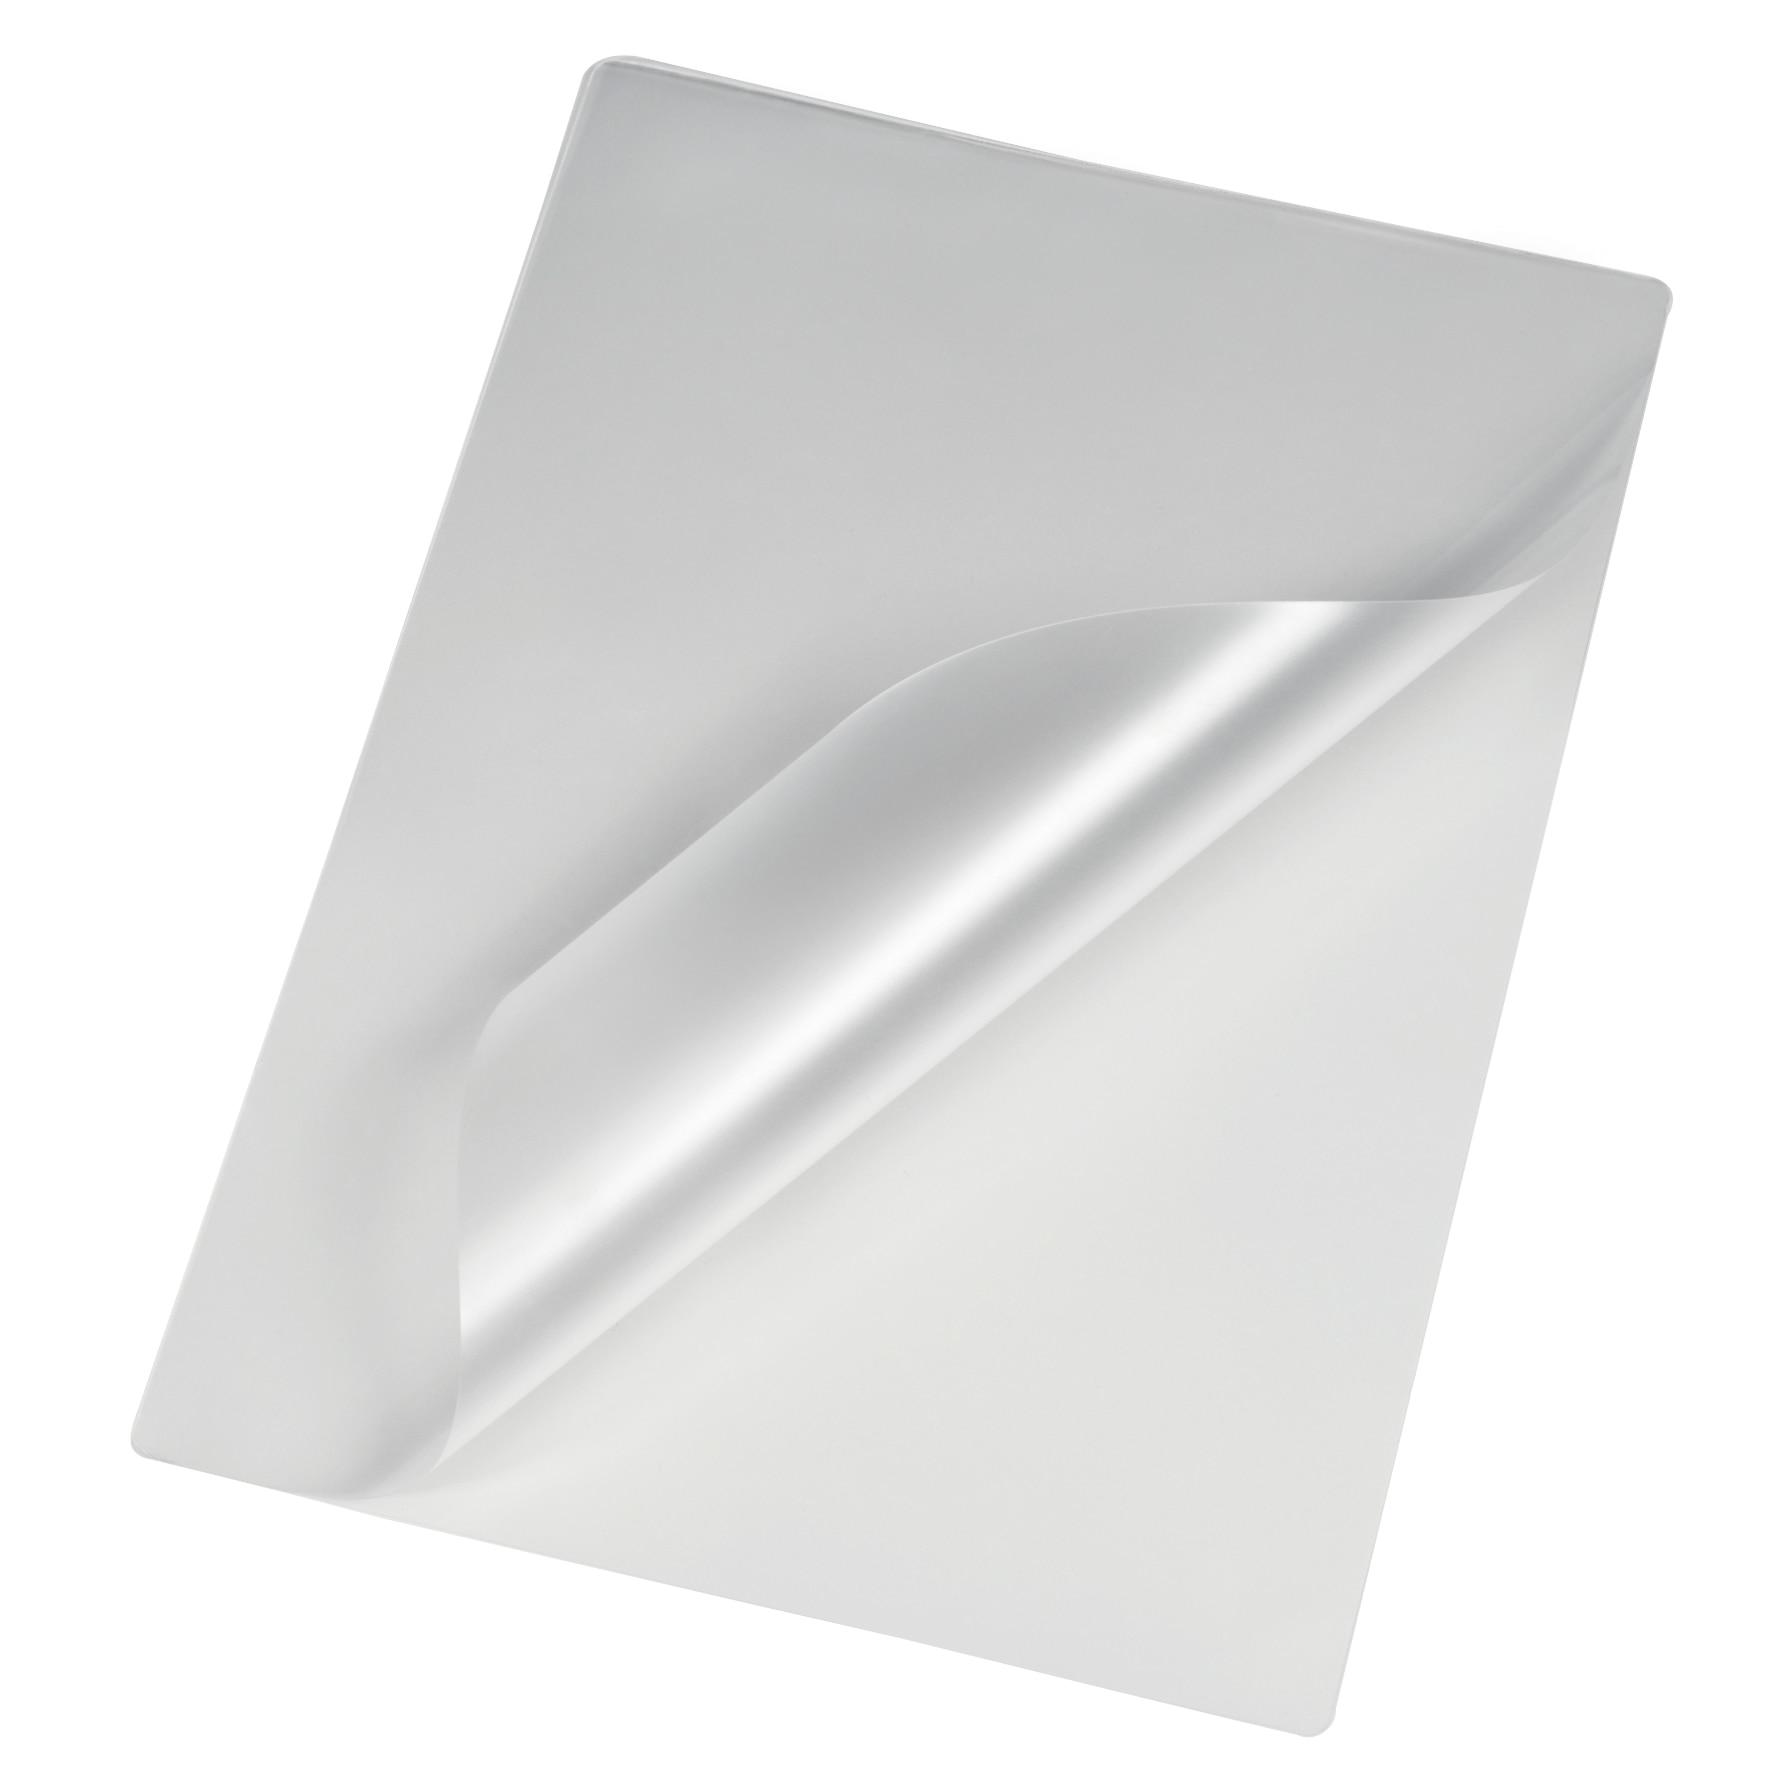 Fotografie Folie laminare Hama A6, 80 microni, 100 buc/top